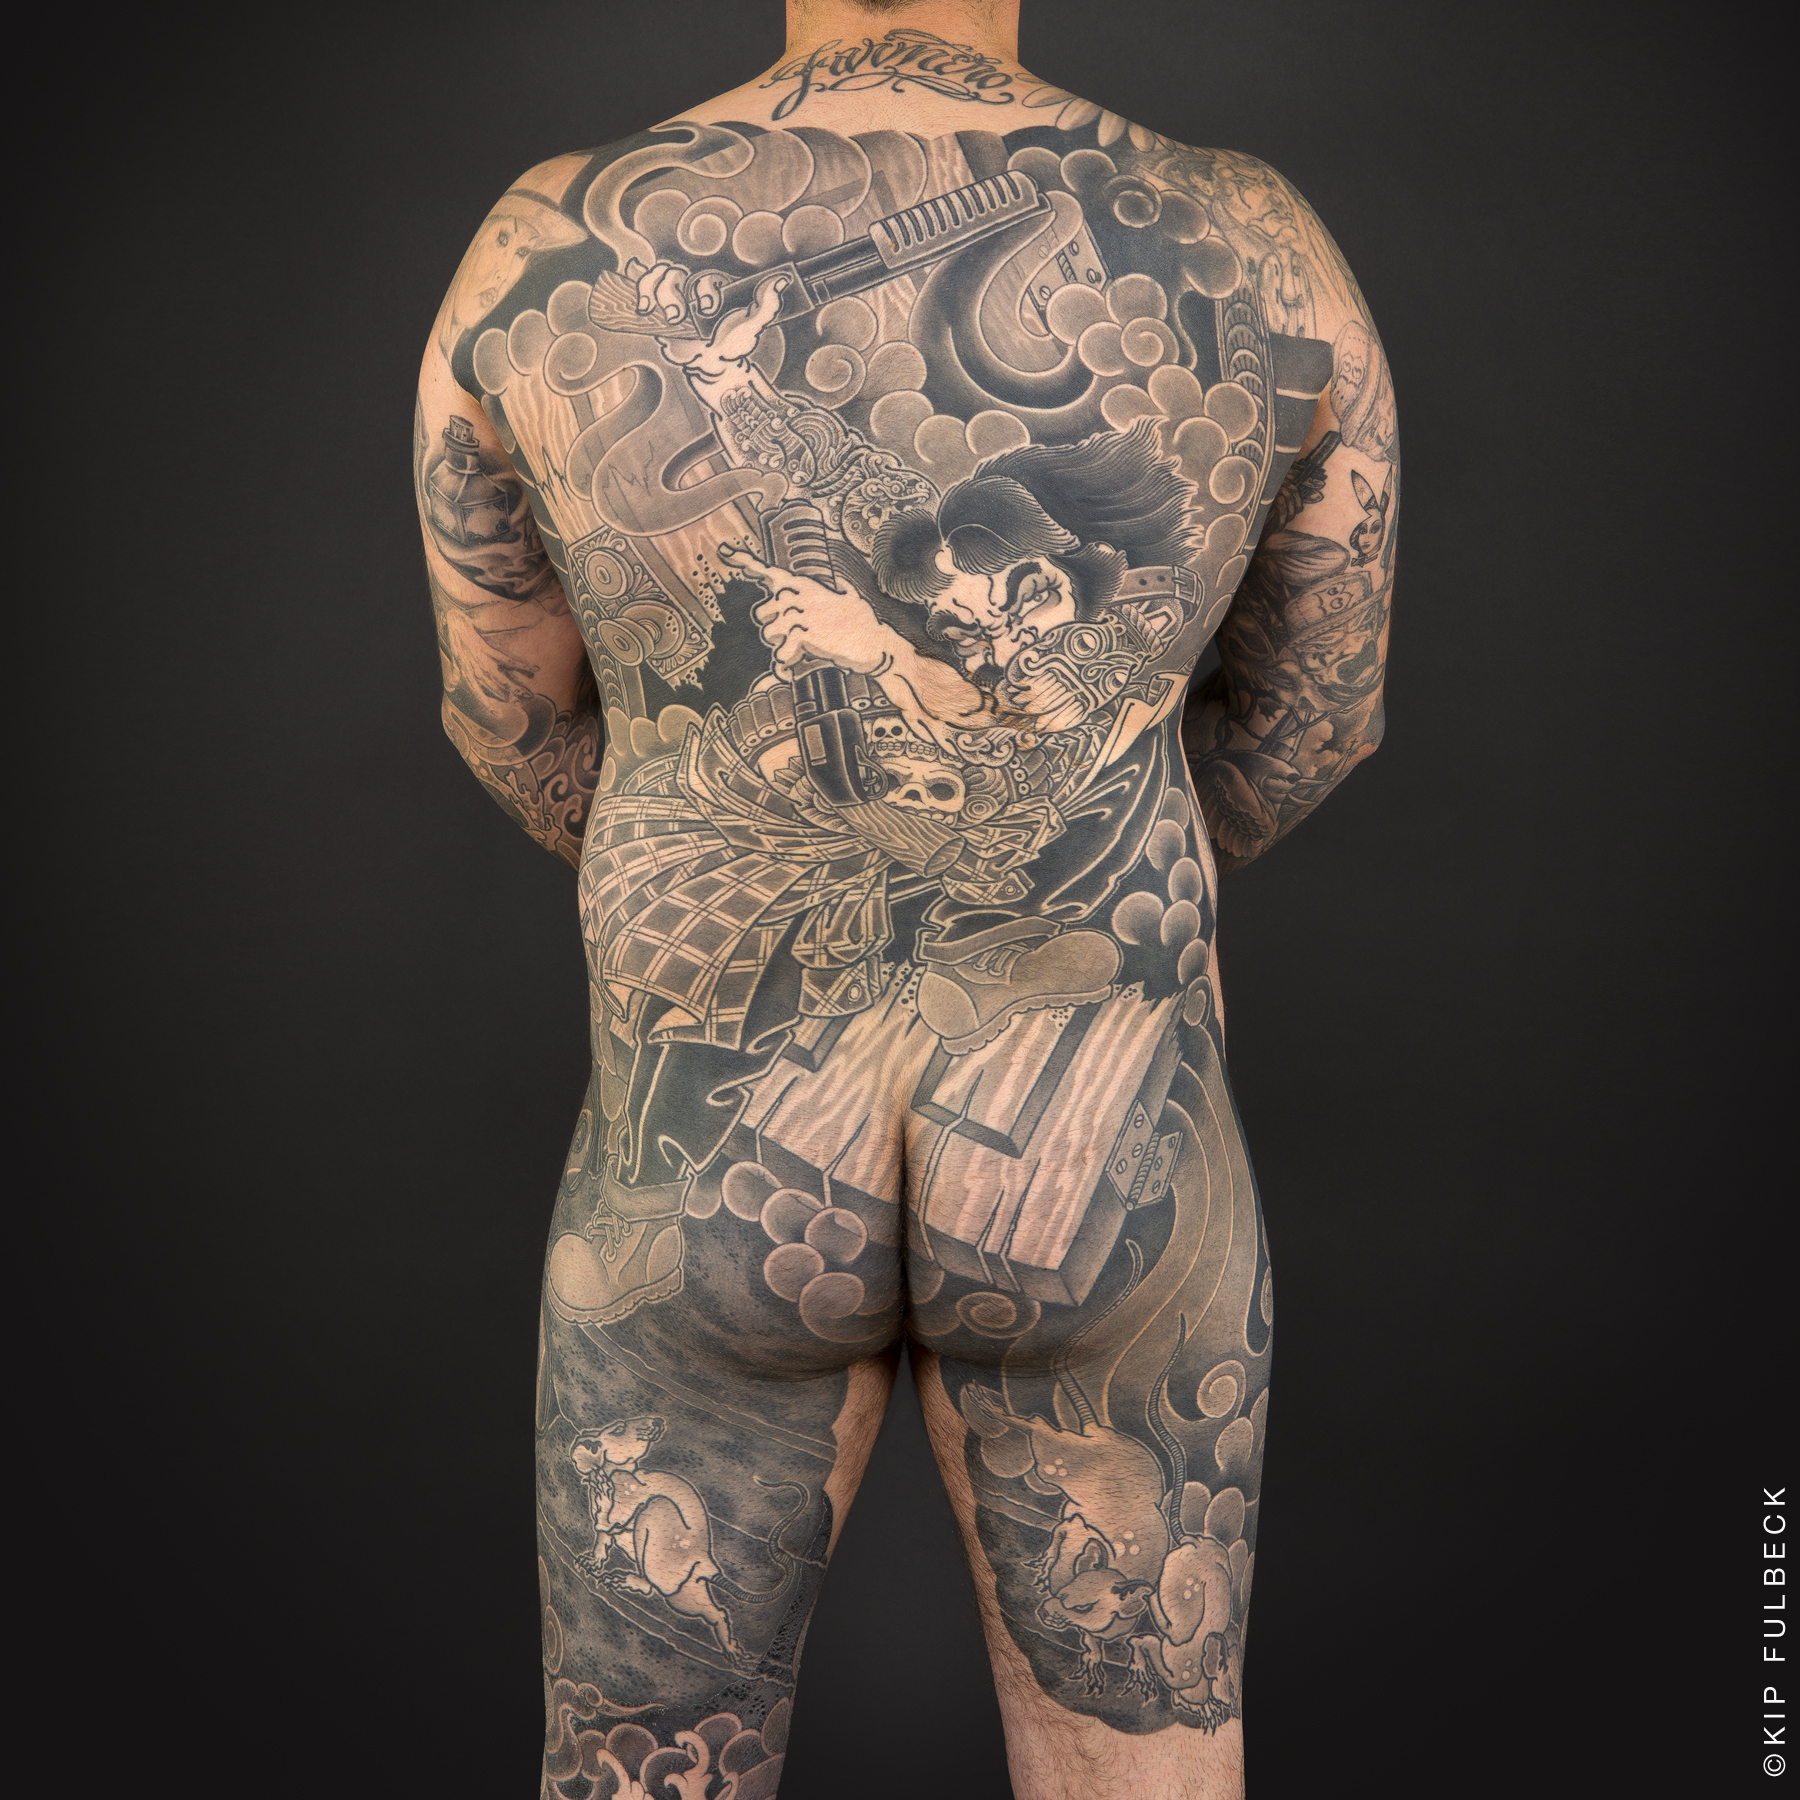 Tattoo by Chris Horishiki Brand. Photo by Kip Fulbeck